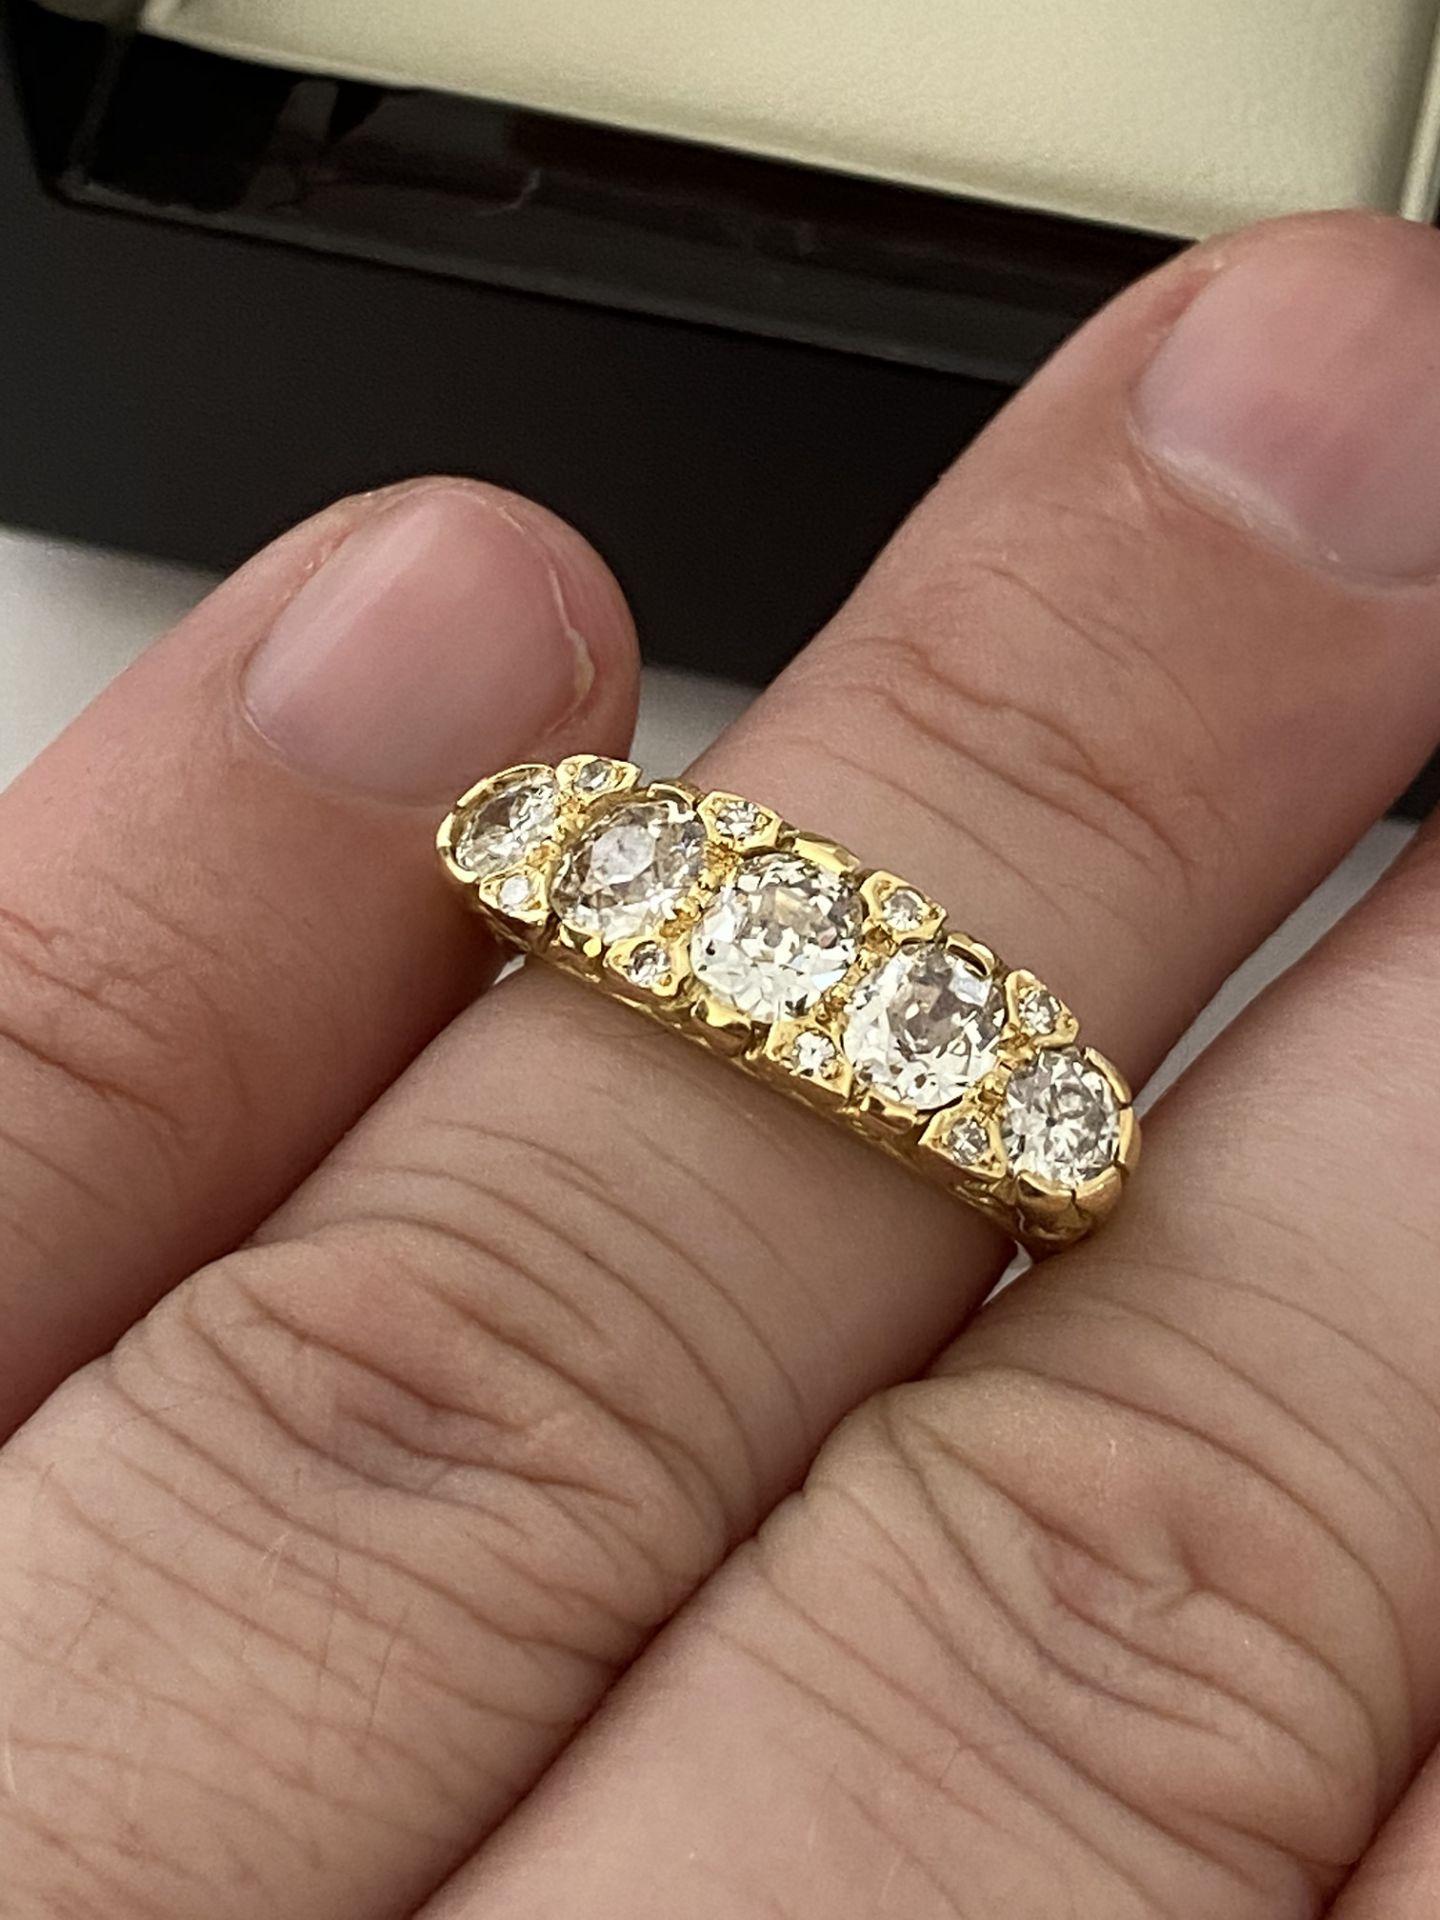 FINE 18ct YELLOW GOLD 2.00ct 5 STONE DIAMOND RING - Image 15 of 15